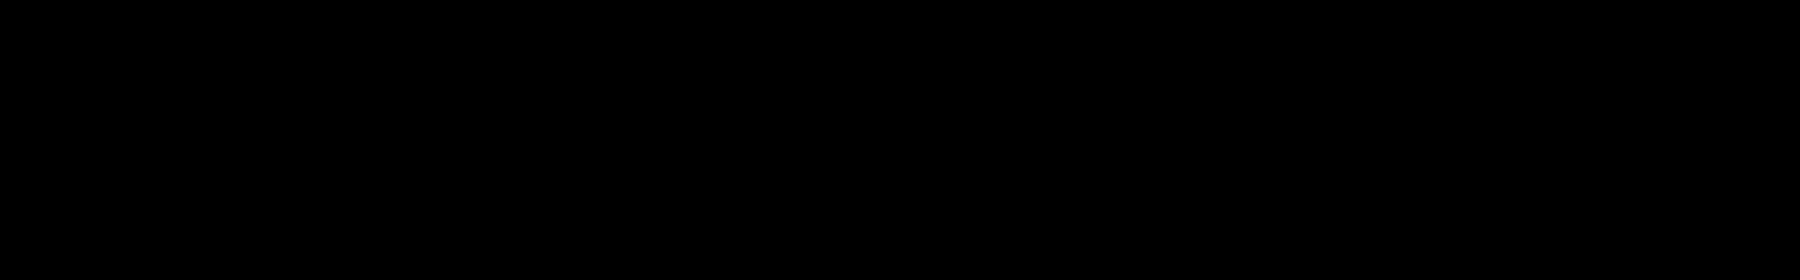 TECHNO Elektron audio waveform